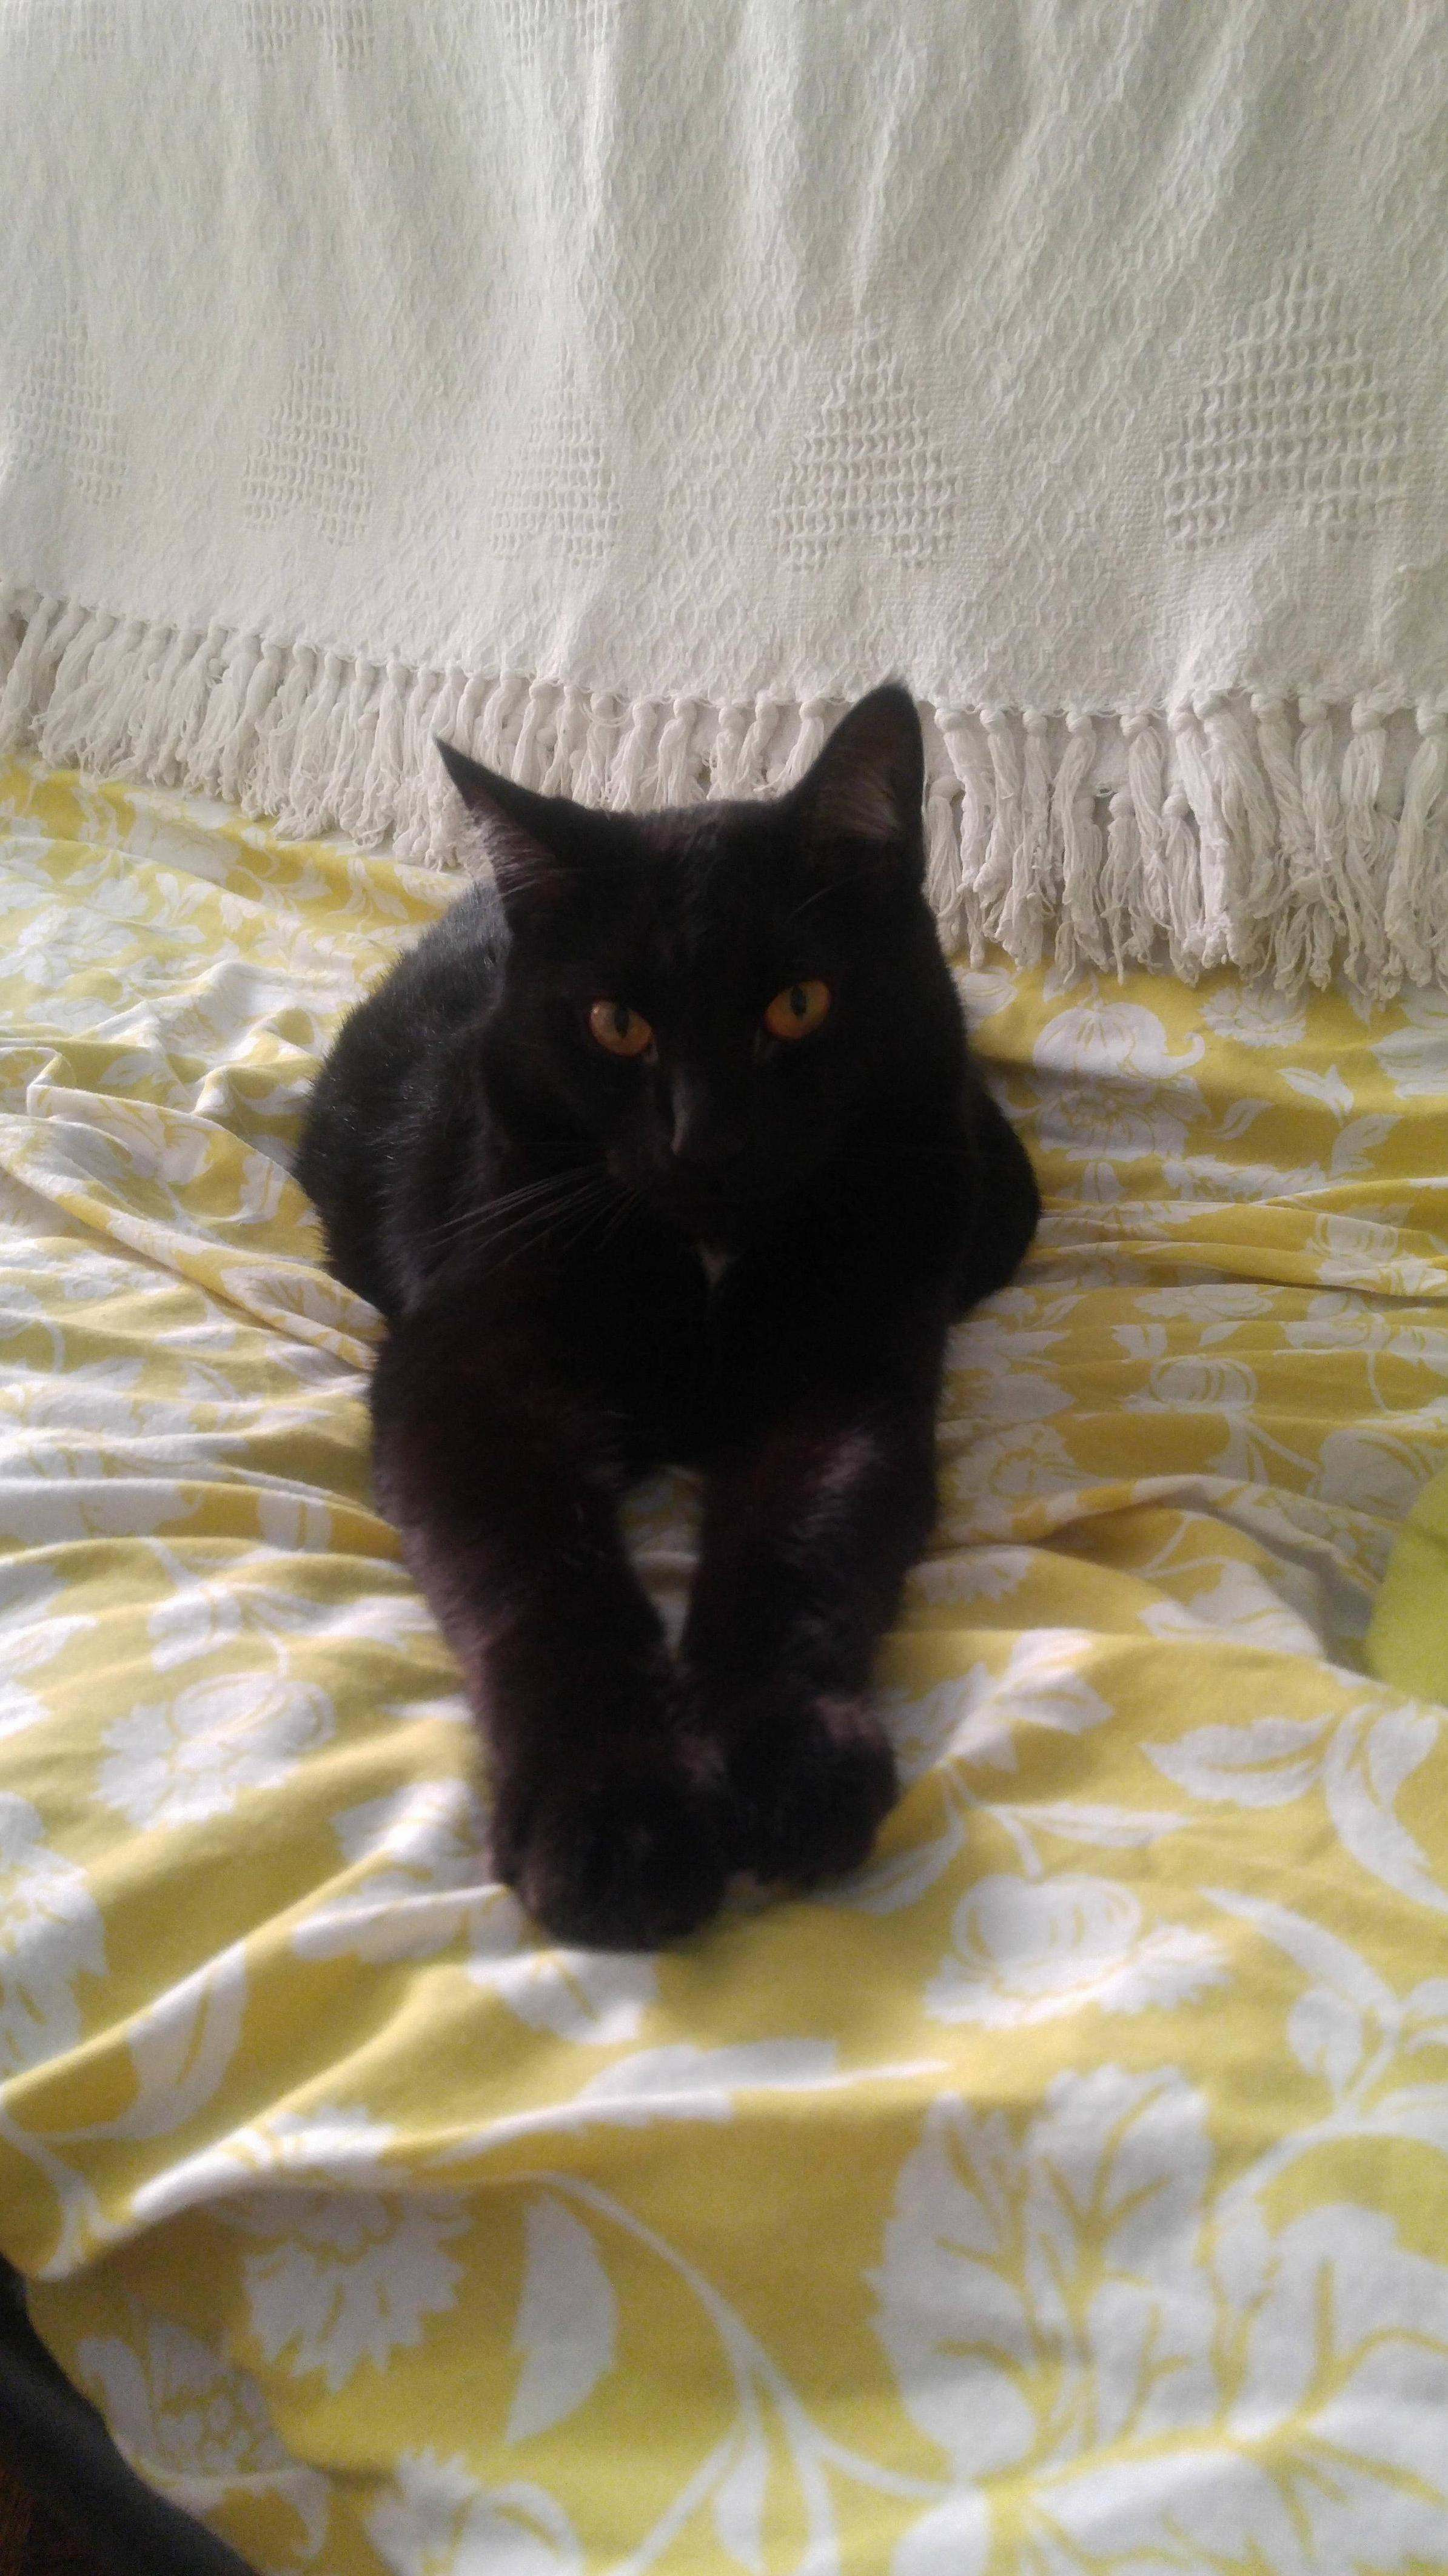 Salem looking sassy